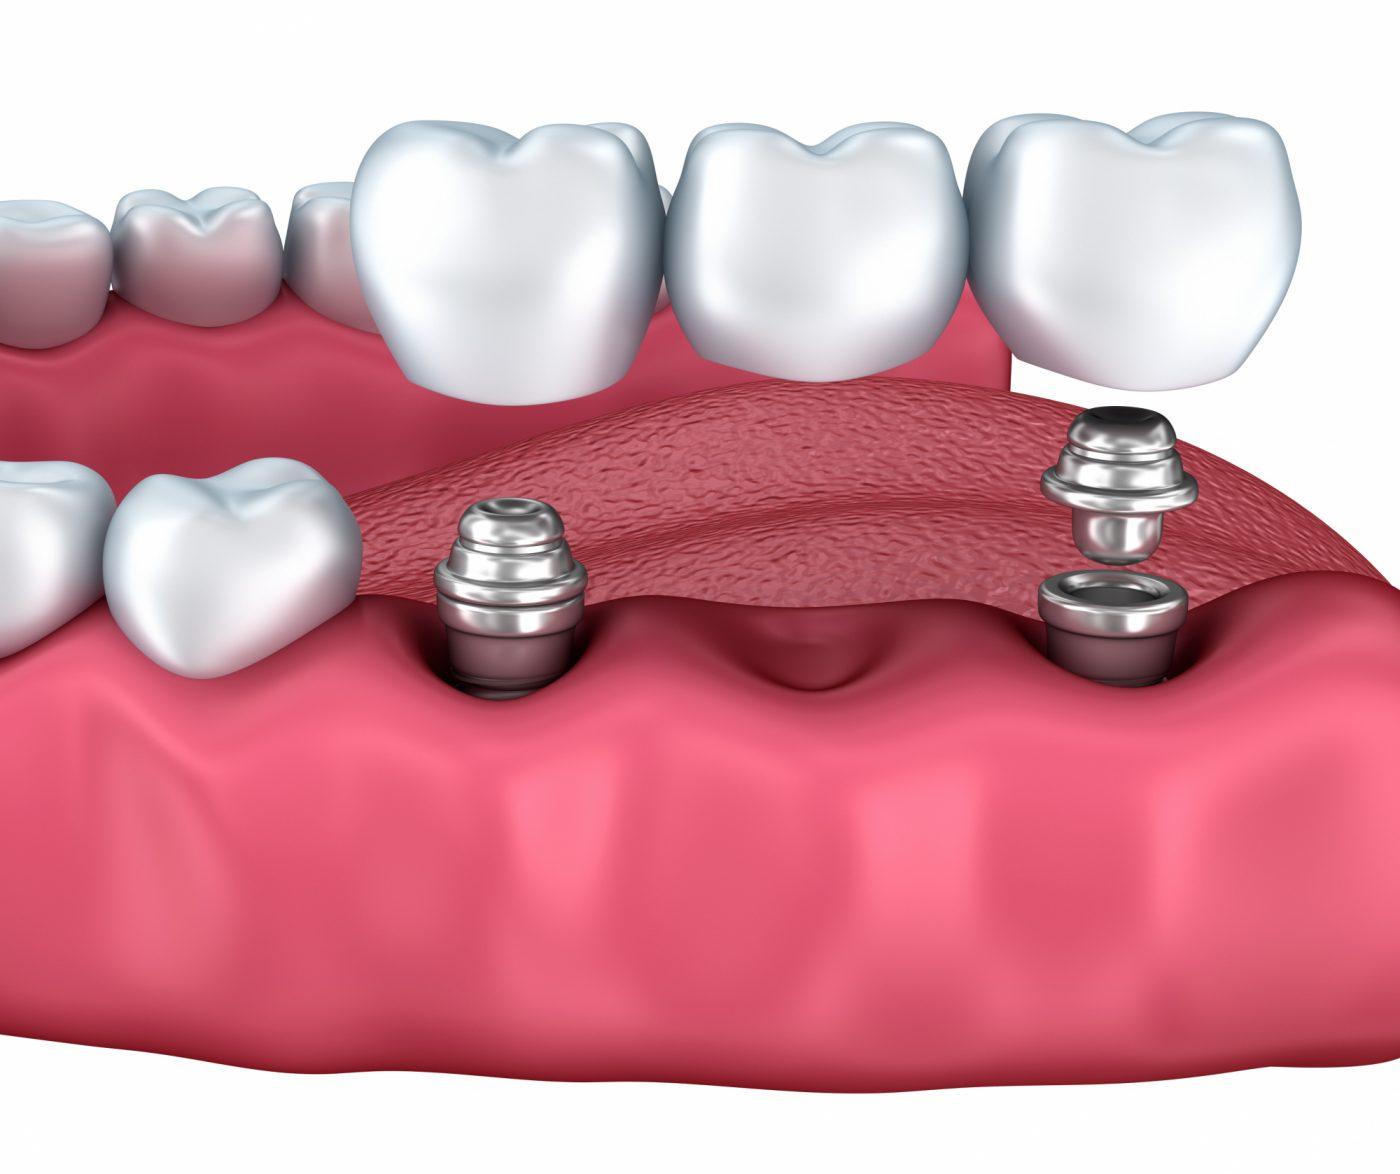 Orthodontics Retainers Jones Dental Implant Clinic Rugby